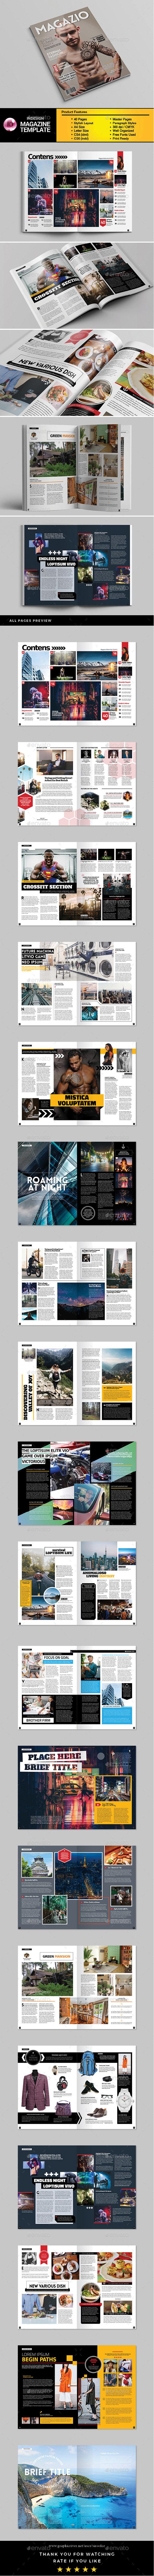 A4 Letter Magazine Template - Magazines Print Templates